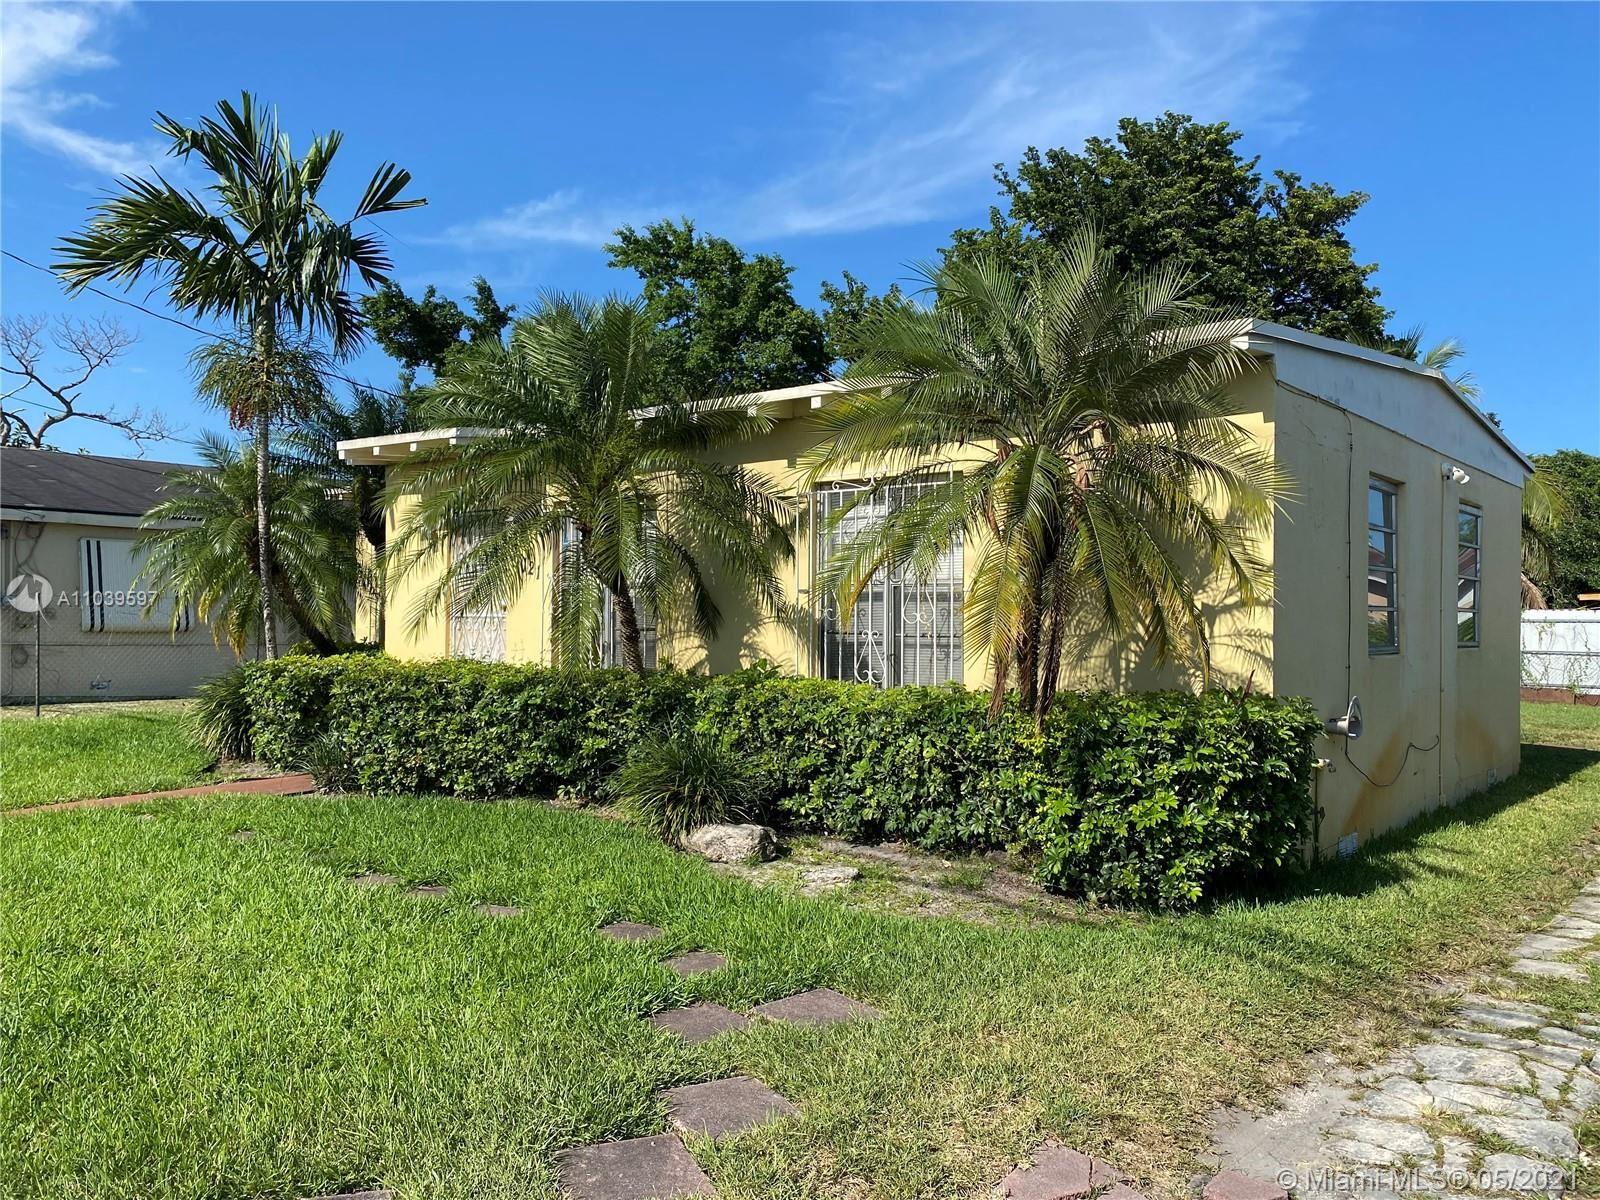 7121 NW 21st Ave, Miami, FL 33147 - #: A11039597